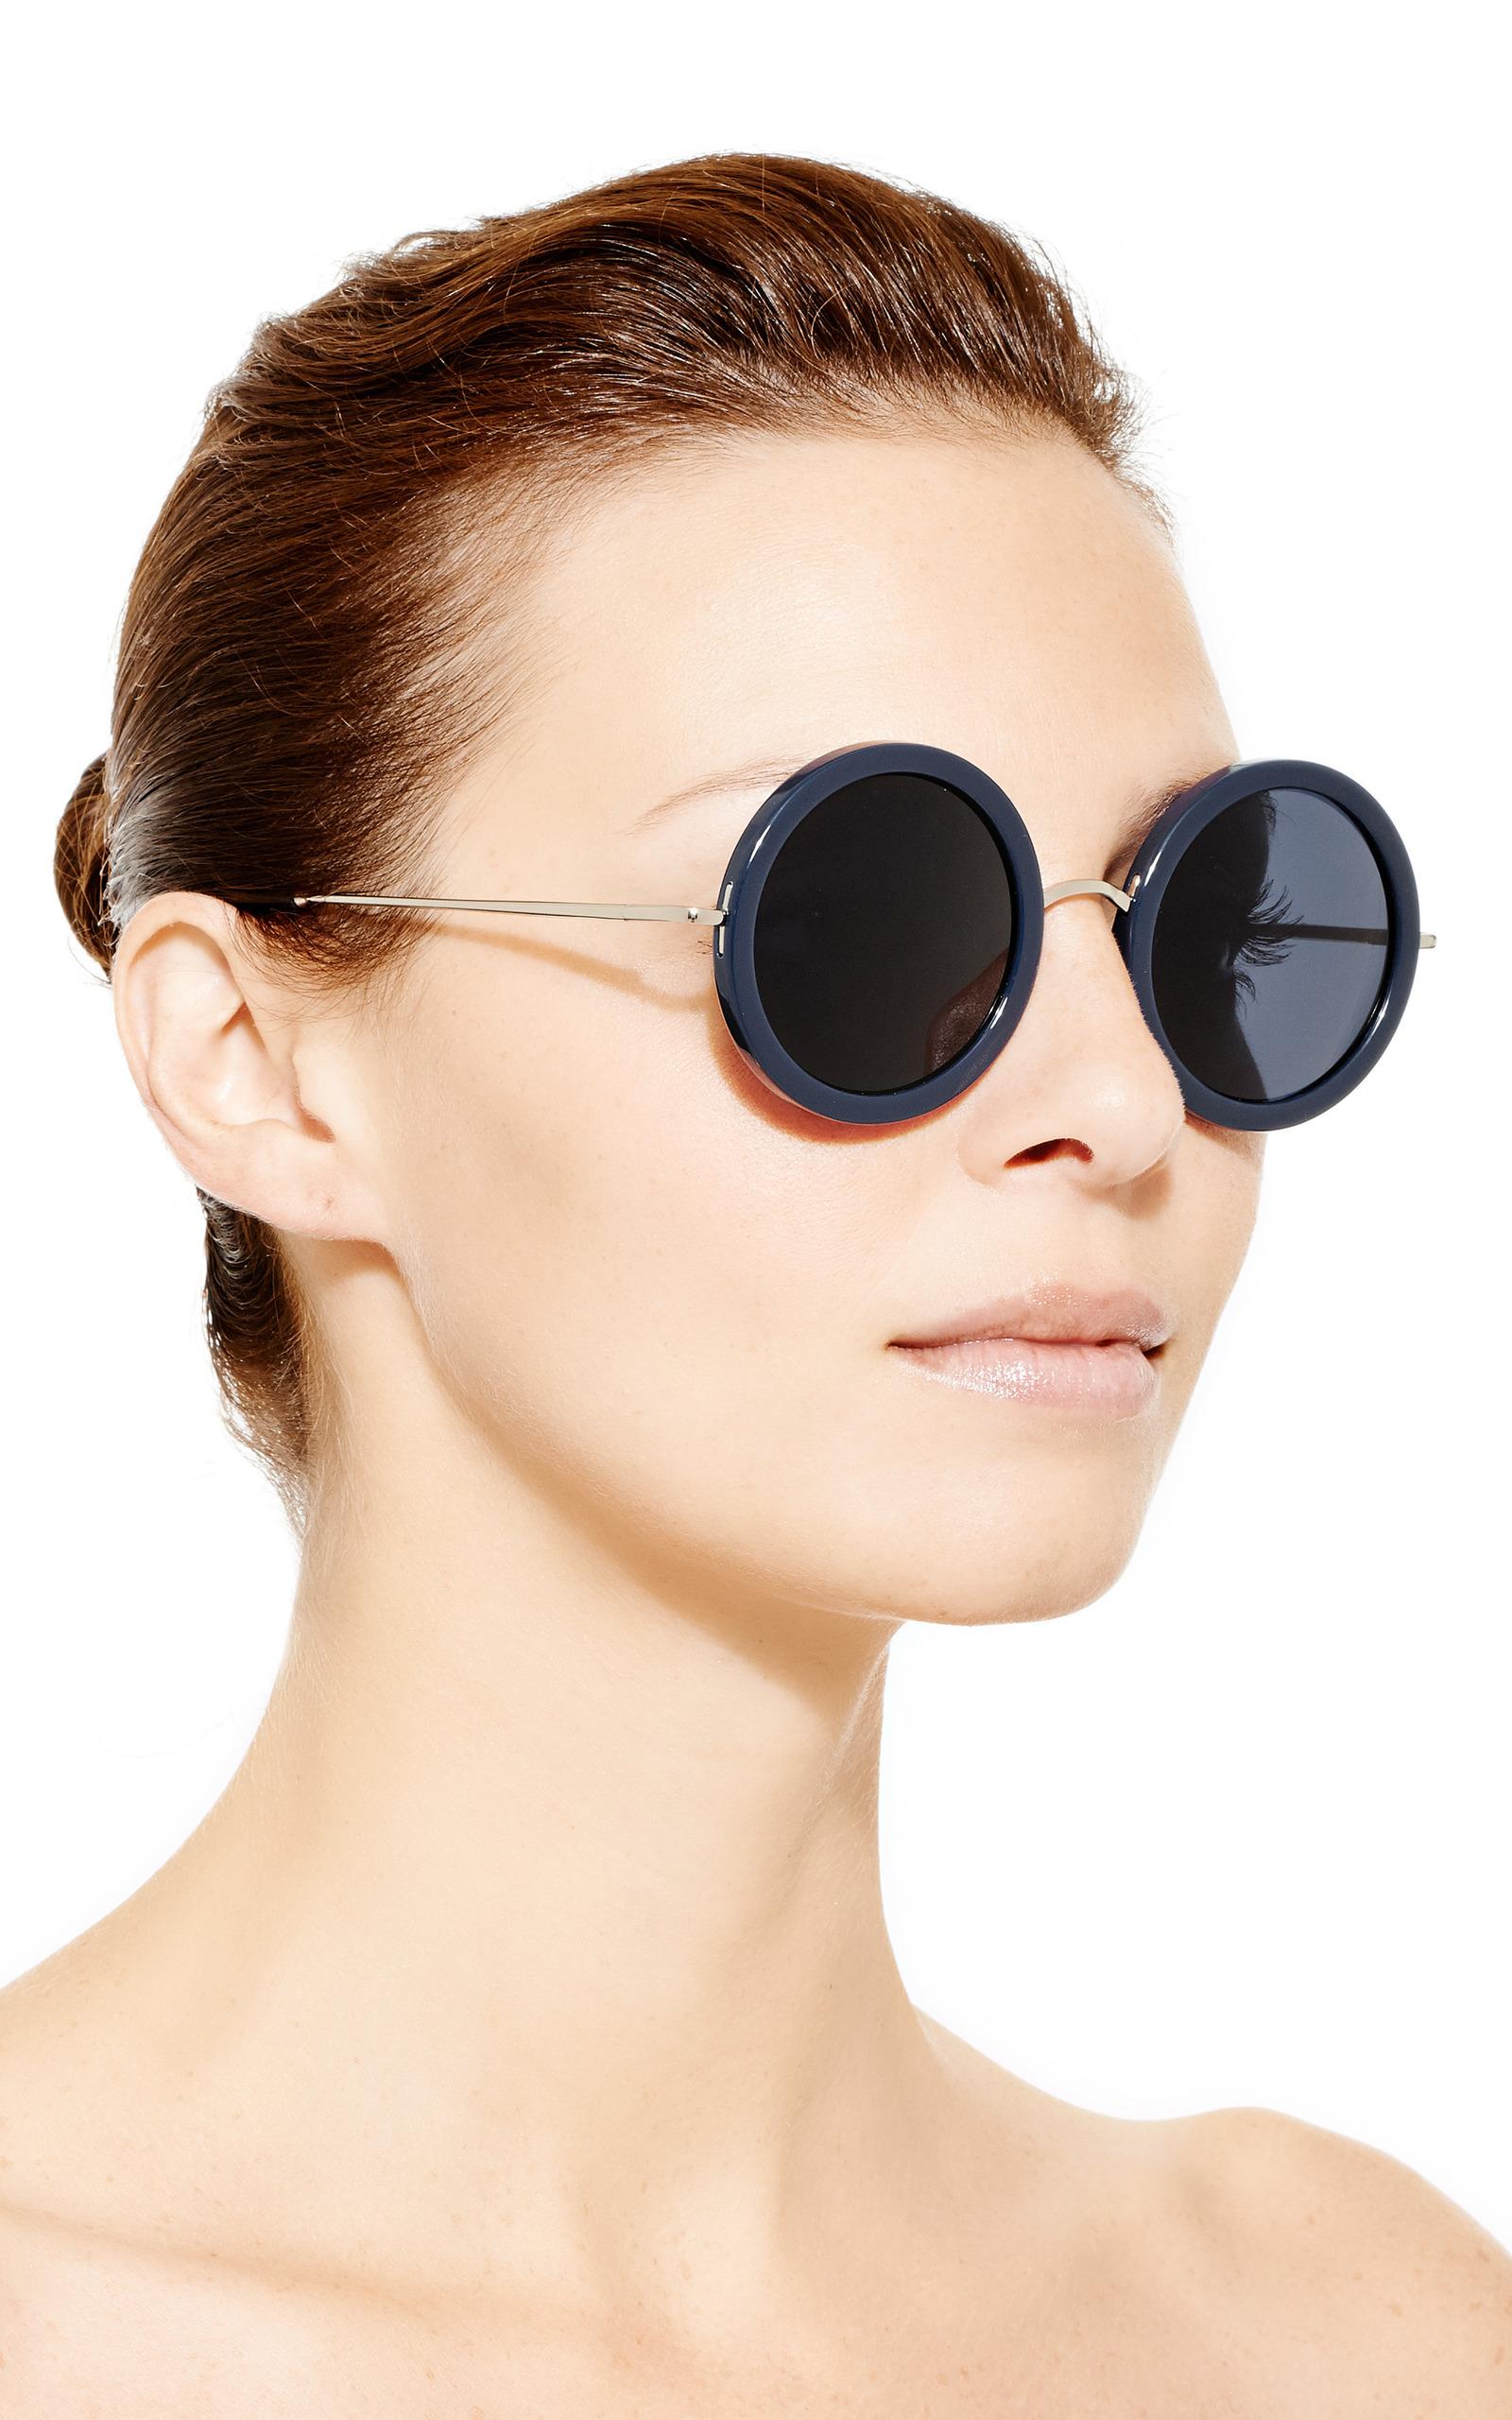 667bf35f6751 Linda FarrowFor The Row Round Frame Sunglasses. CLOSE. Loading